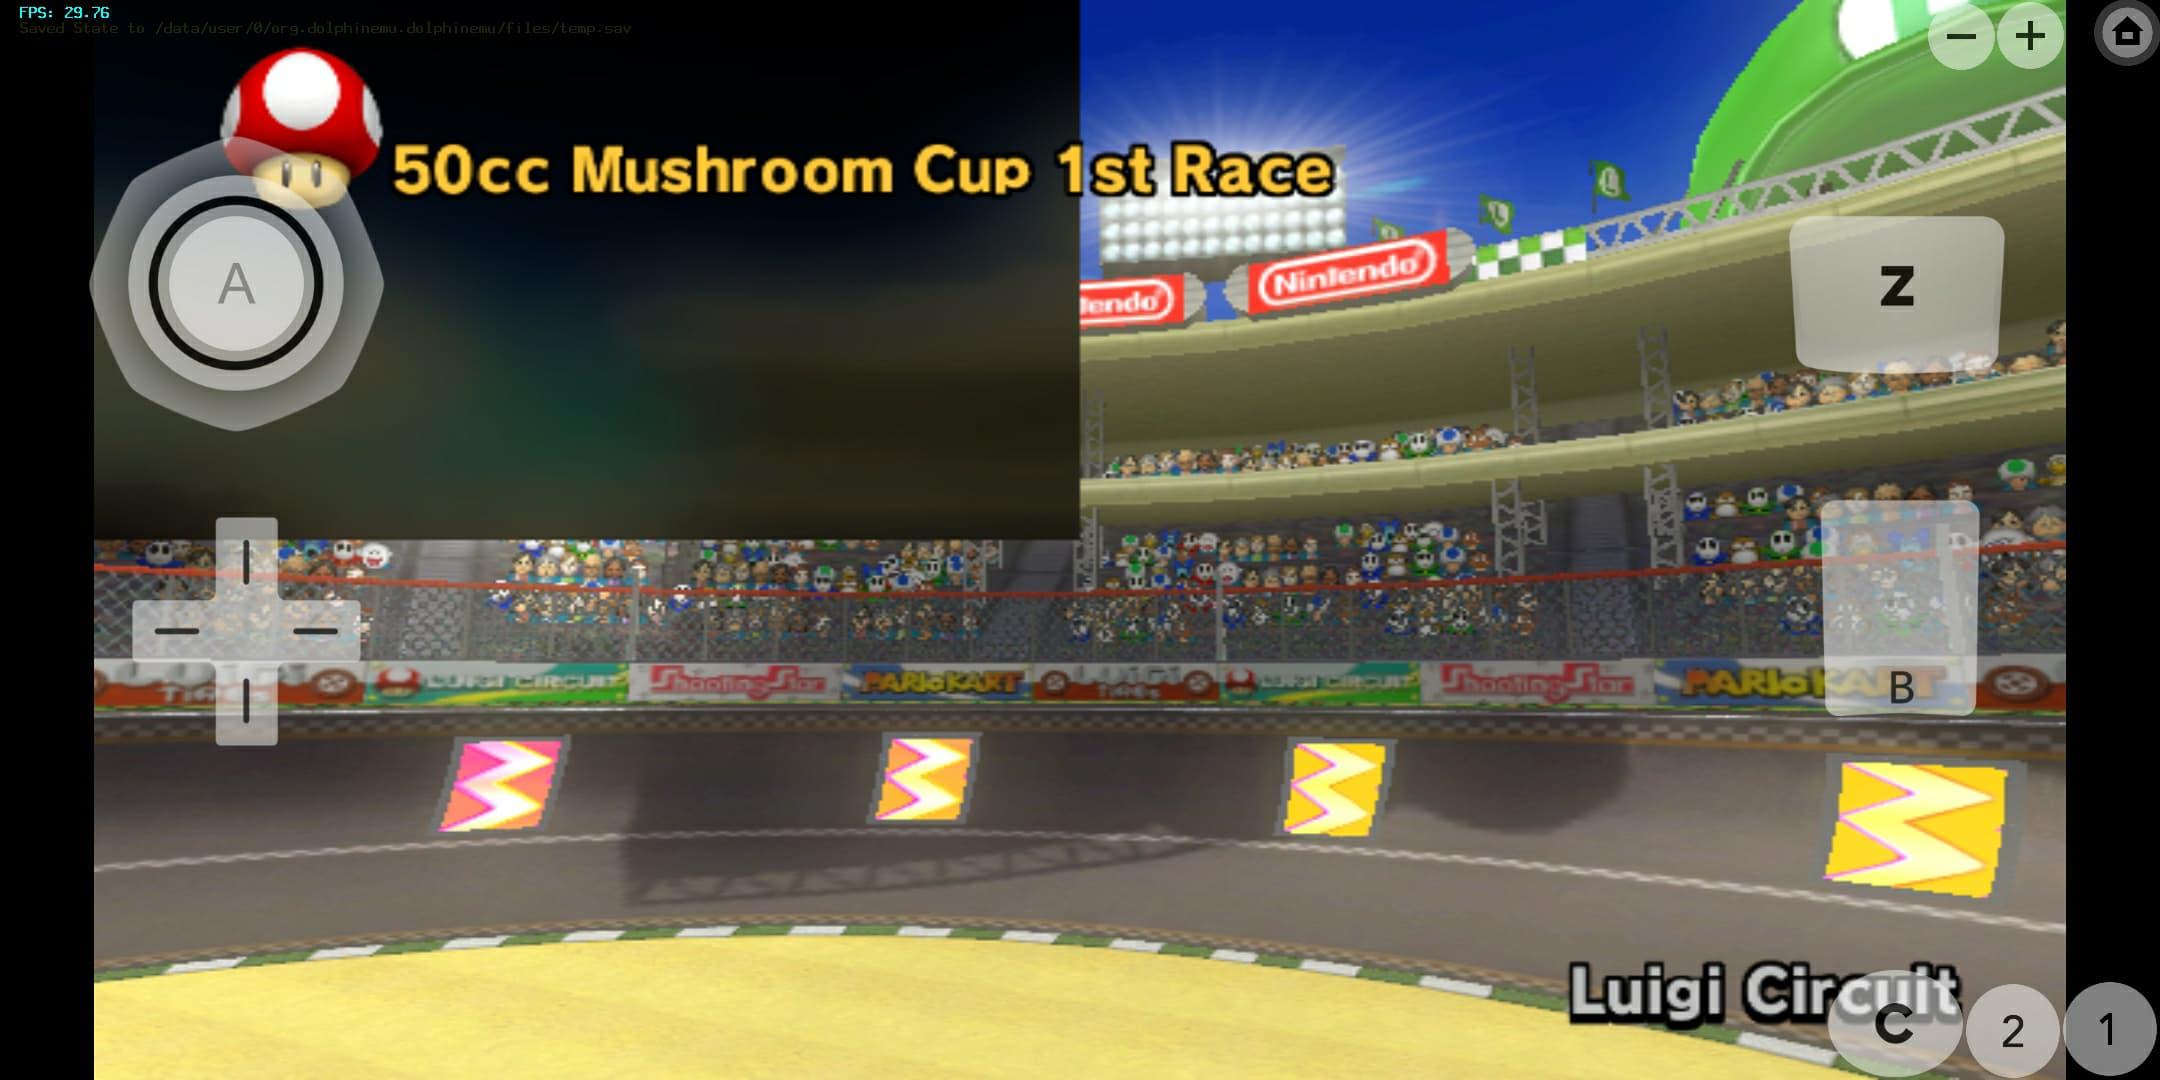 Emulator Issues 10929 Android Adreno 540 Opengl Mario Kart Wii Luigi Circuit 28641319 1806879732676852 1848947714 O 166 Kb